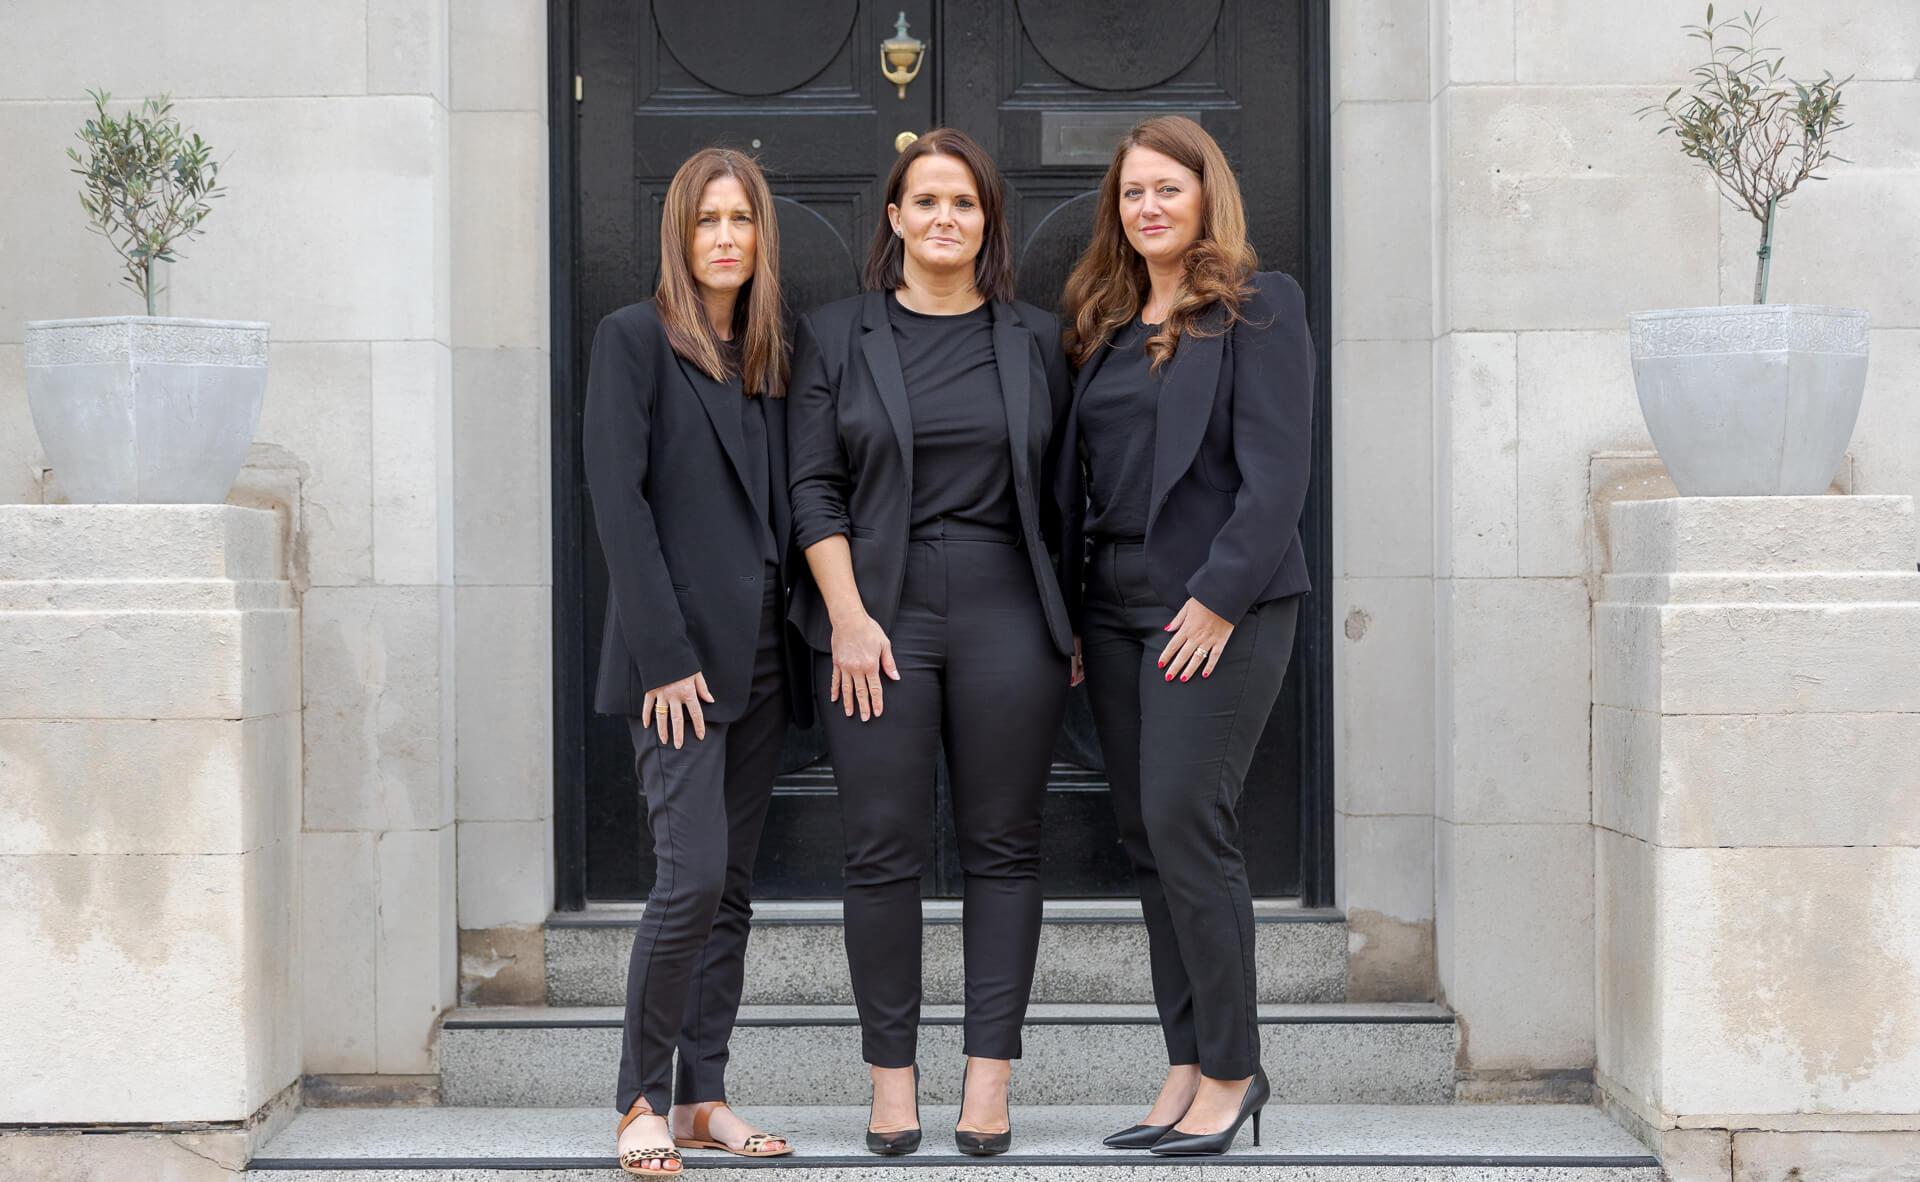 3 women standing aside each other in front of a door